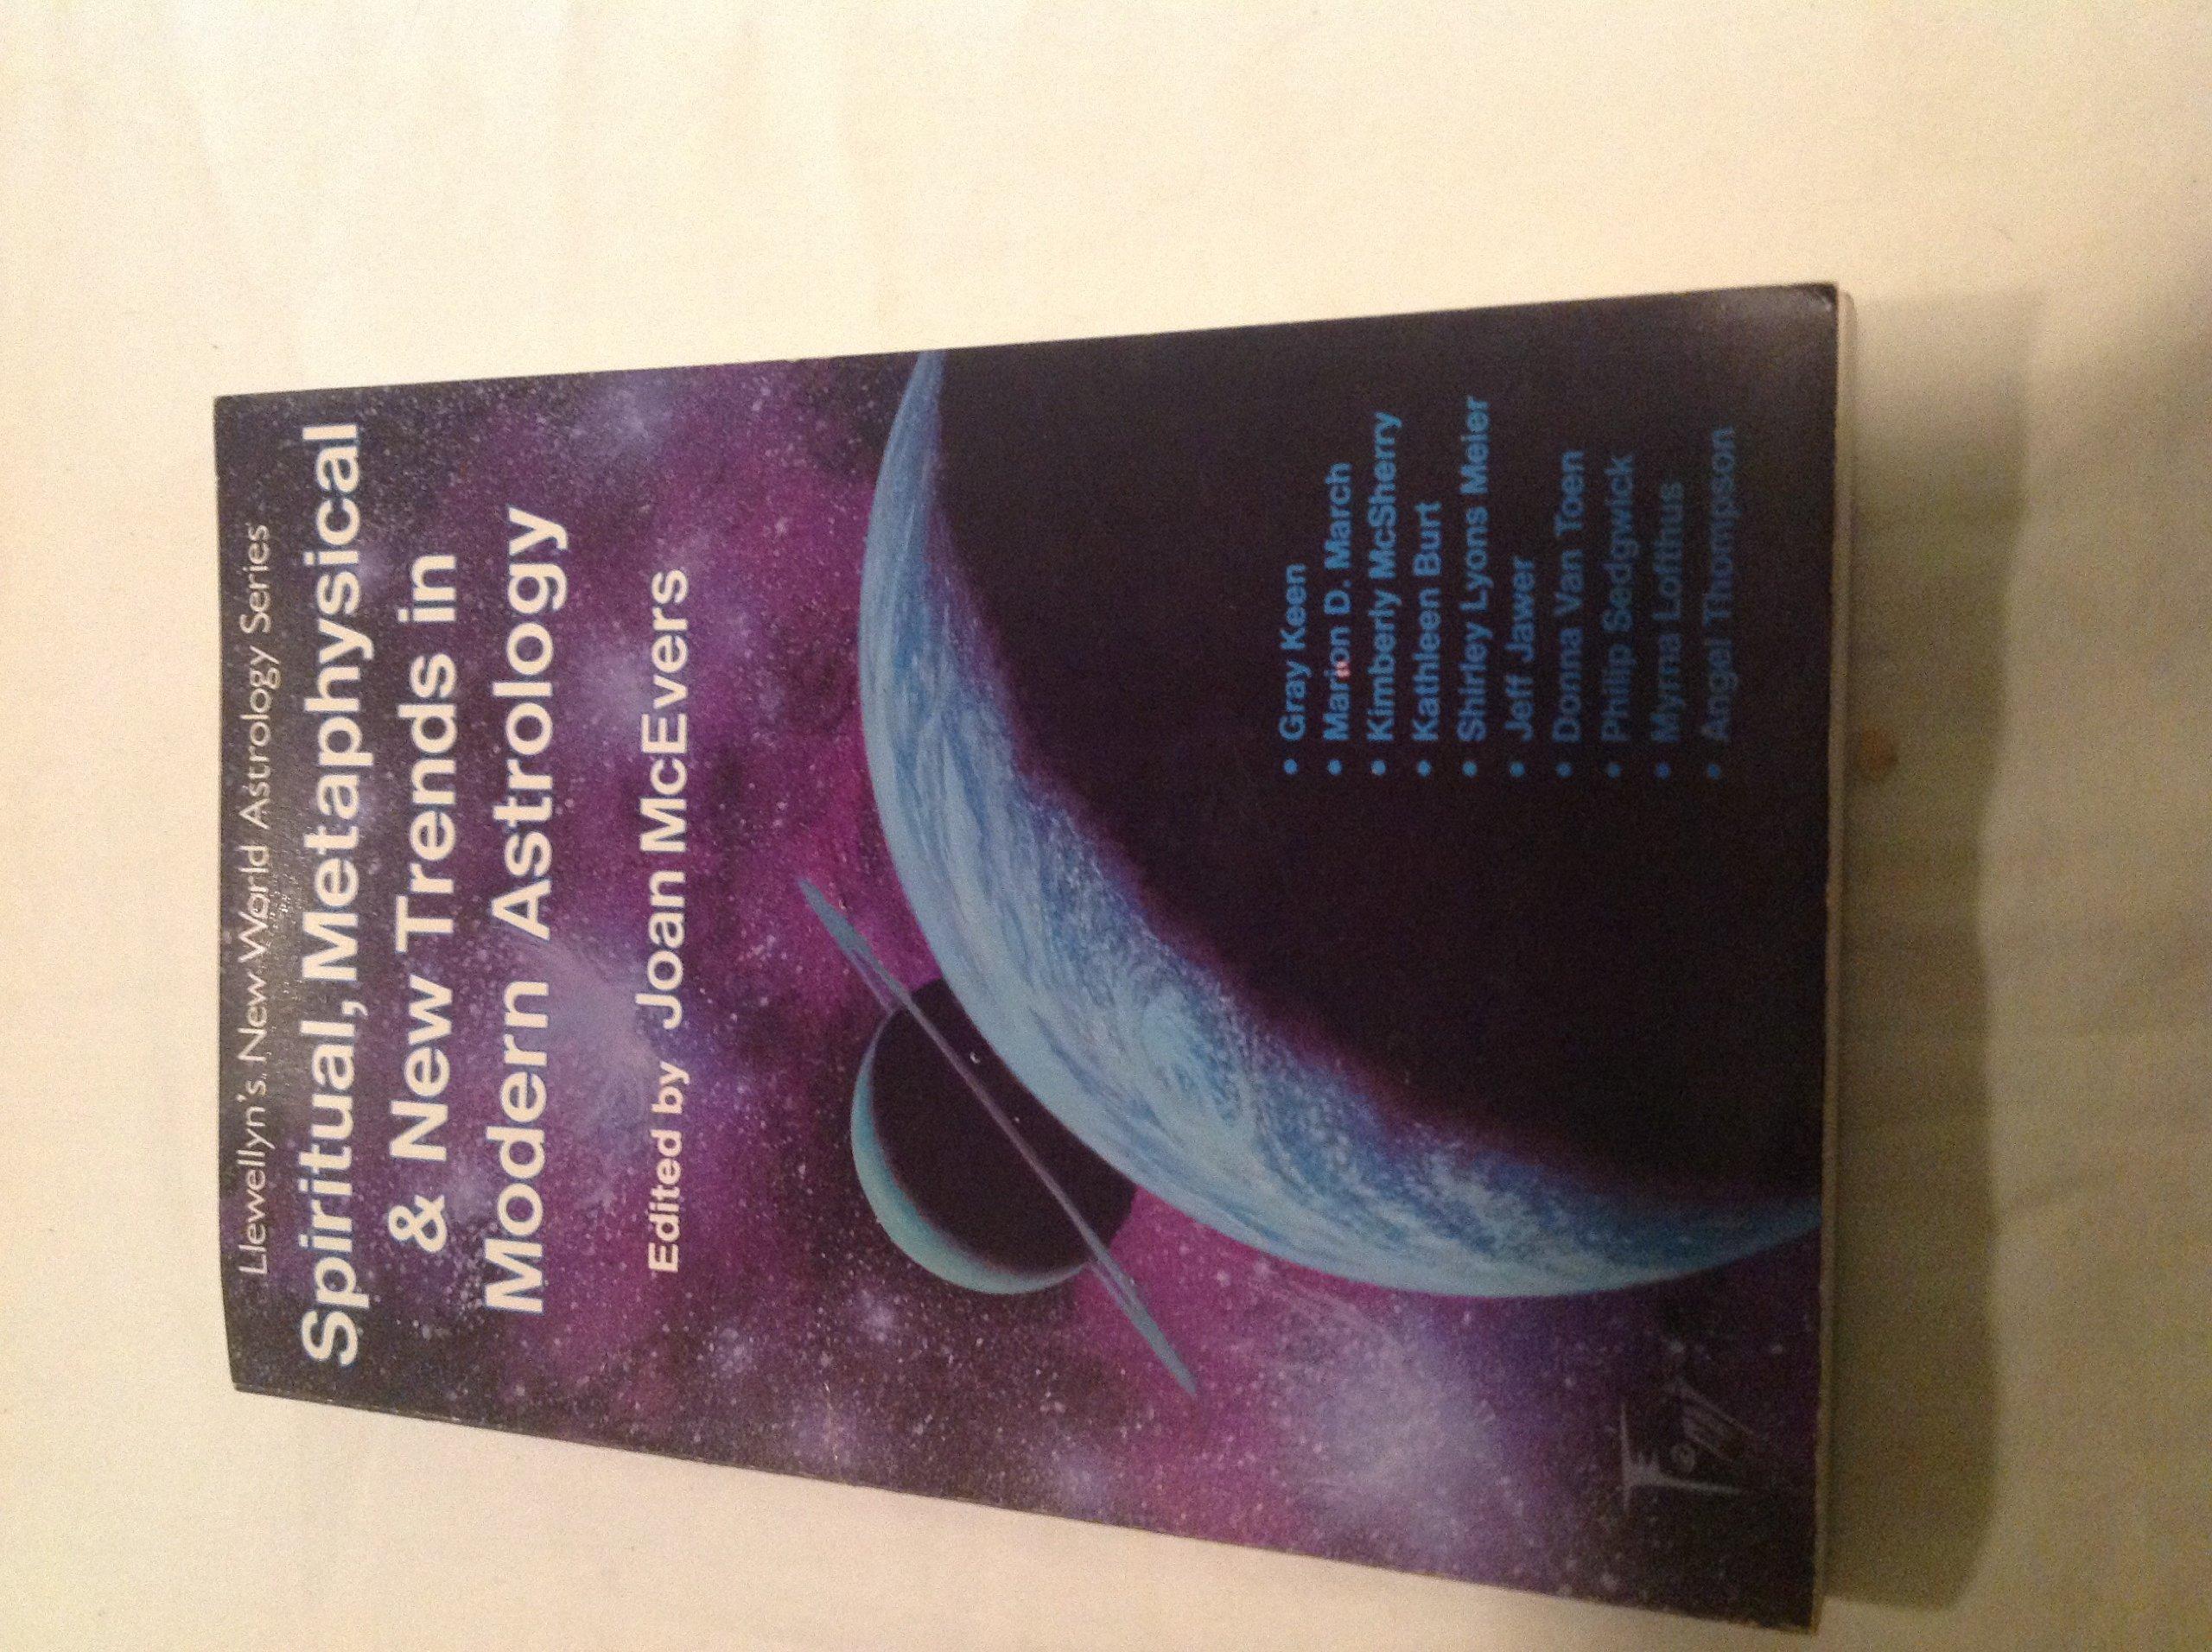 Spiritual, Metaphysical & New Trends in Modern Astology (Llewellyn's New World Astrology Series)